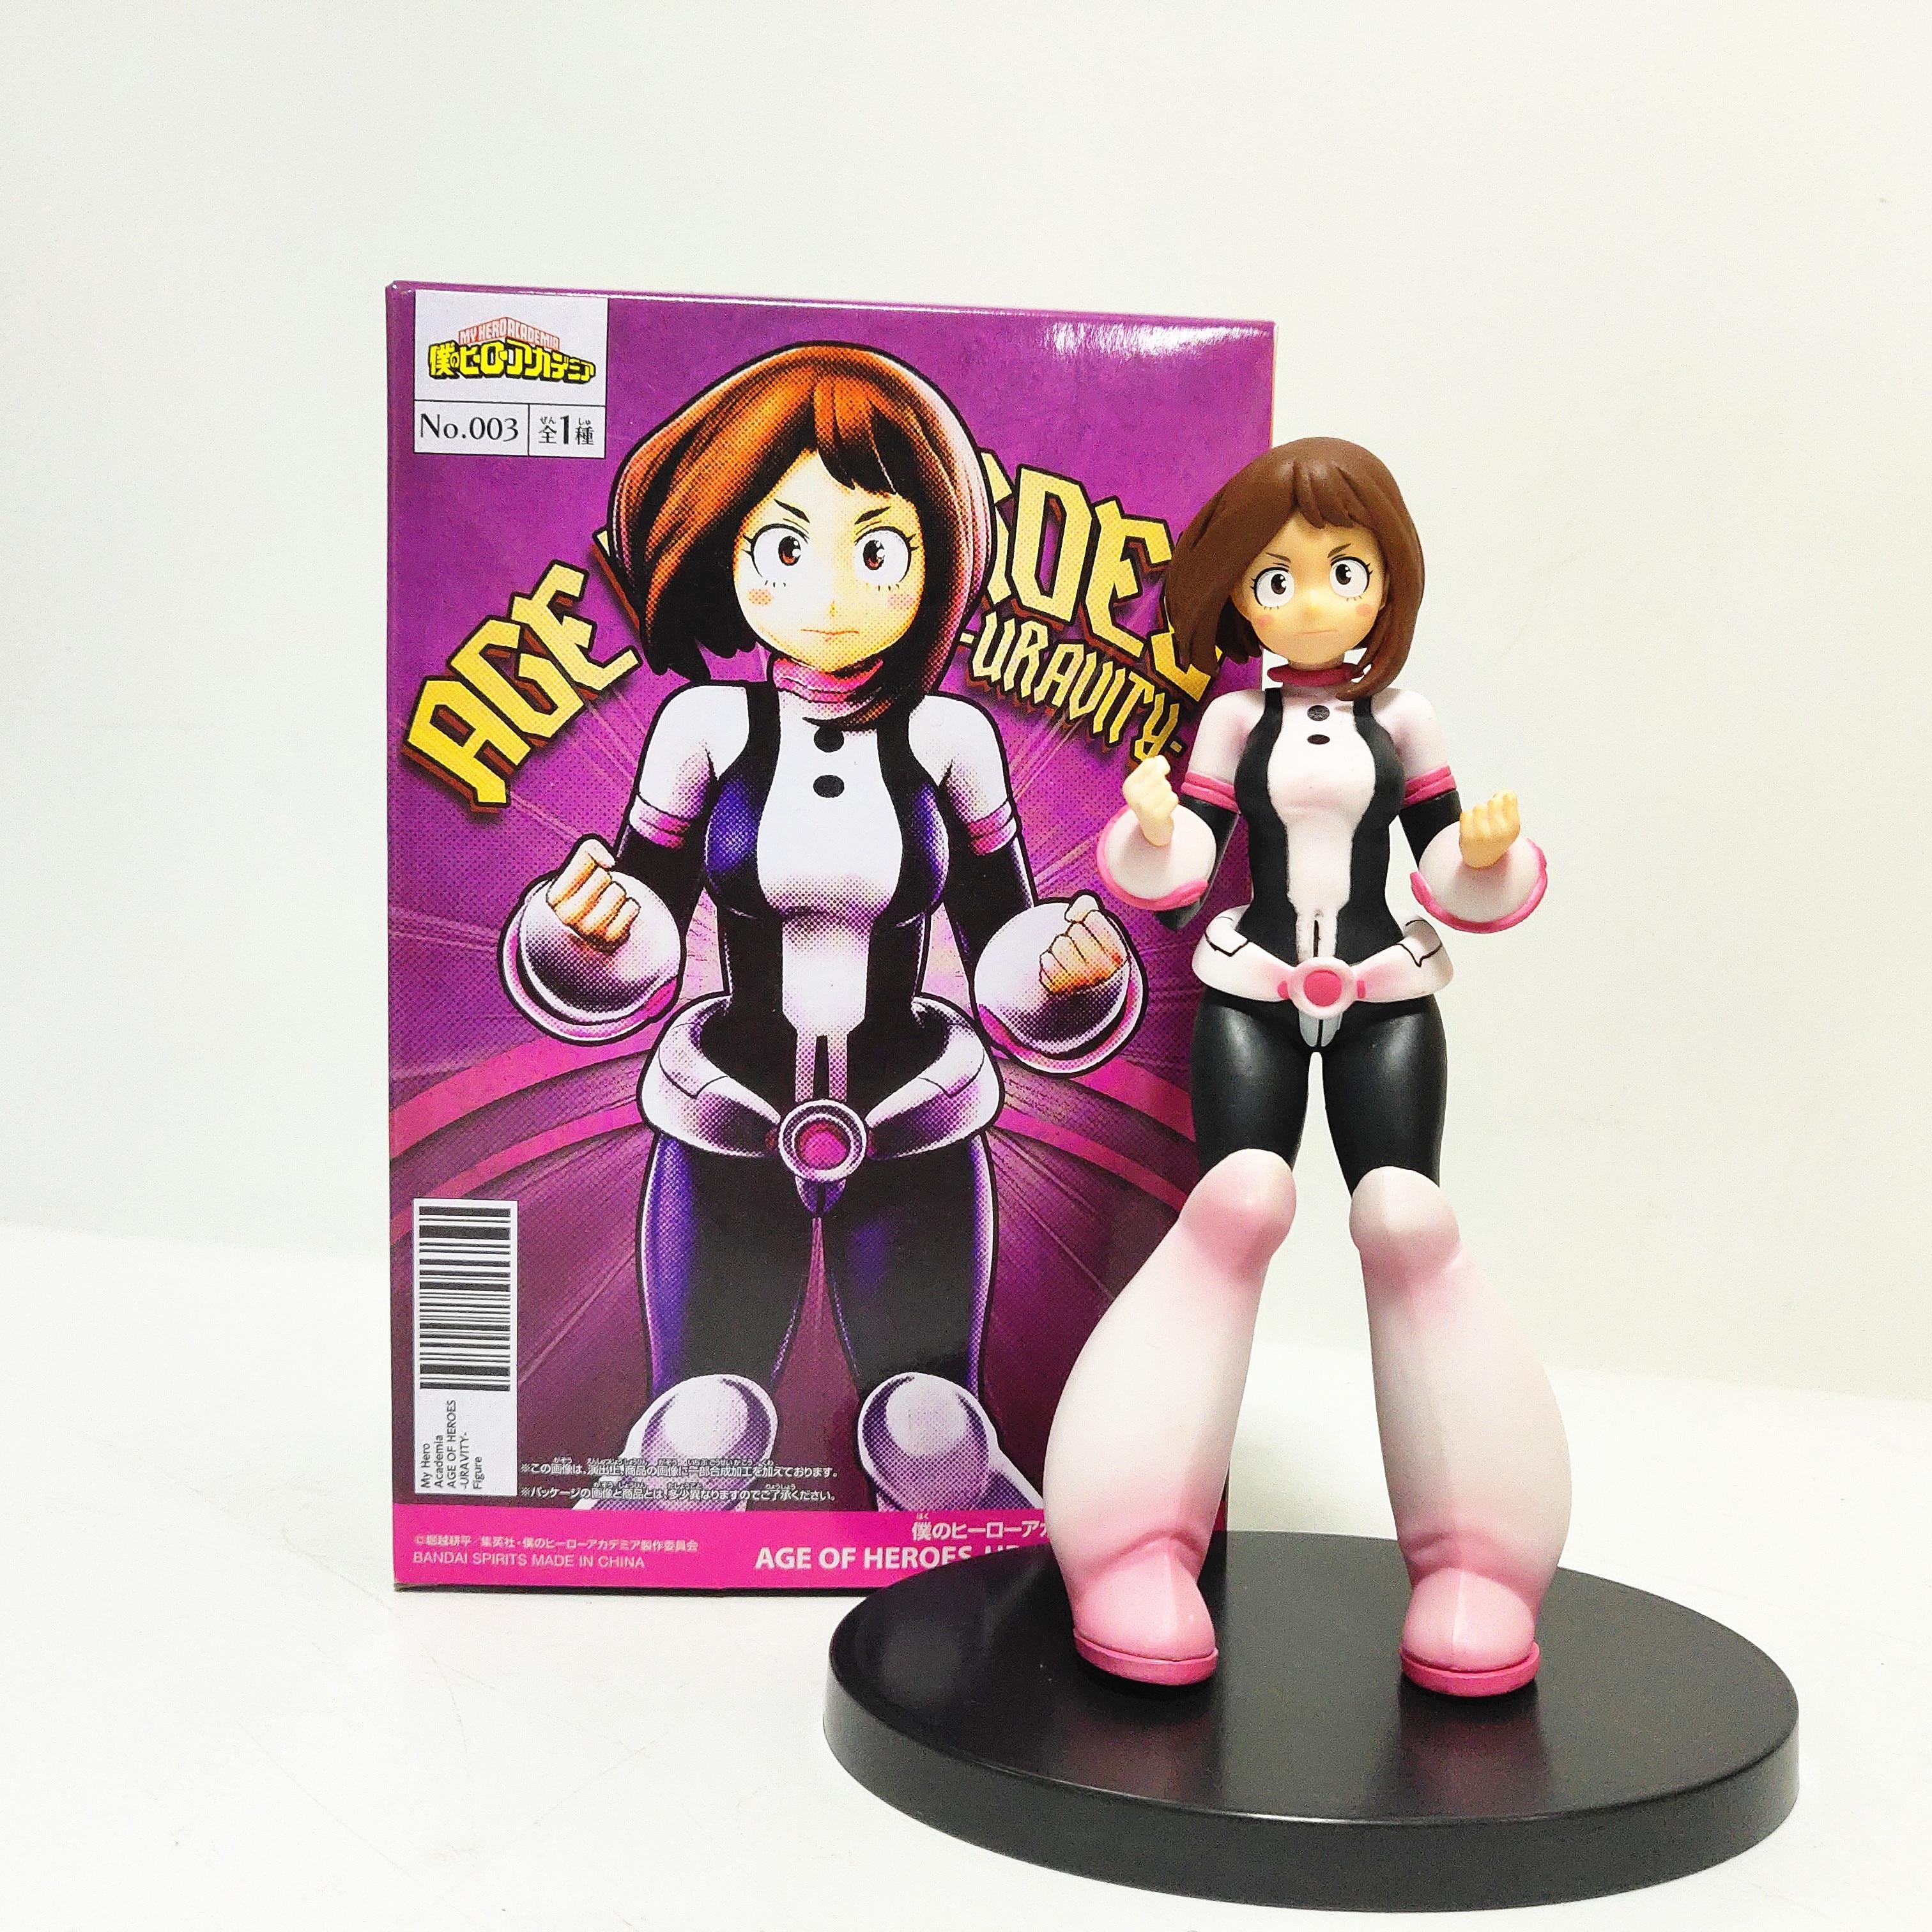 Anime My Hero Academia OCHACO URARAKA 160mm PVC Action Figure Boku No Hero Academia Model Toys Figurine Dolls Gift